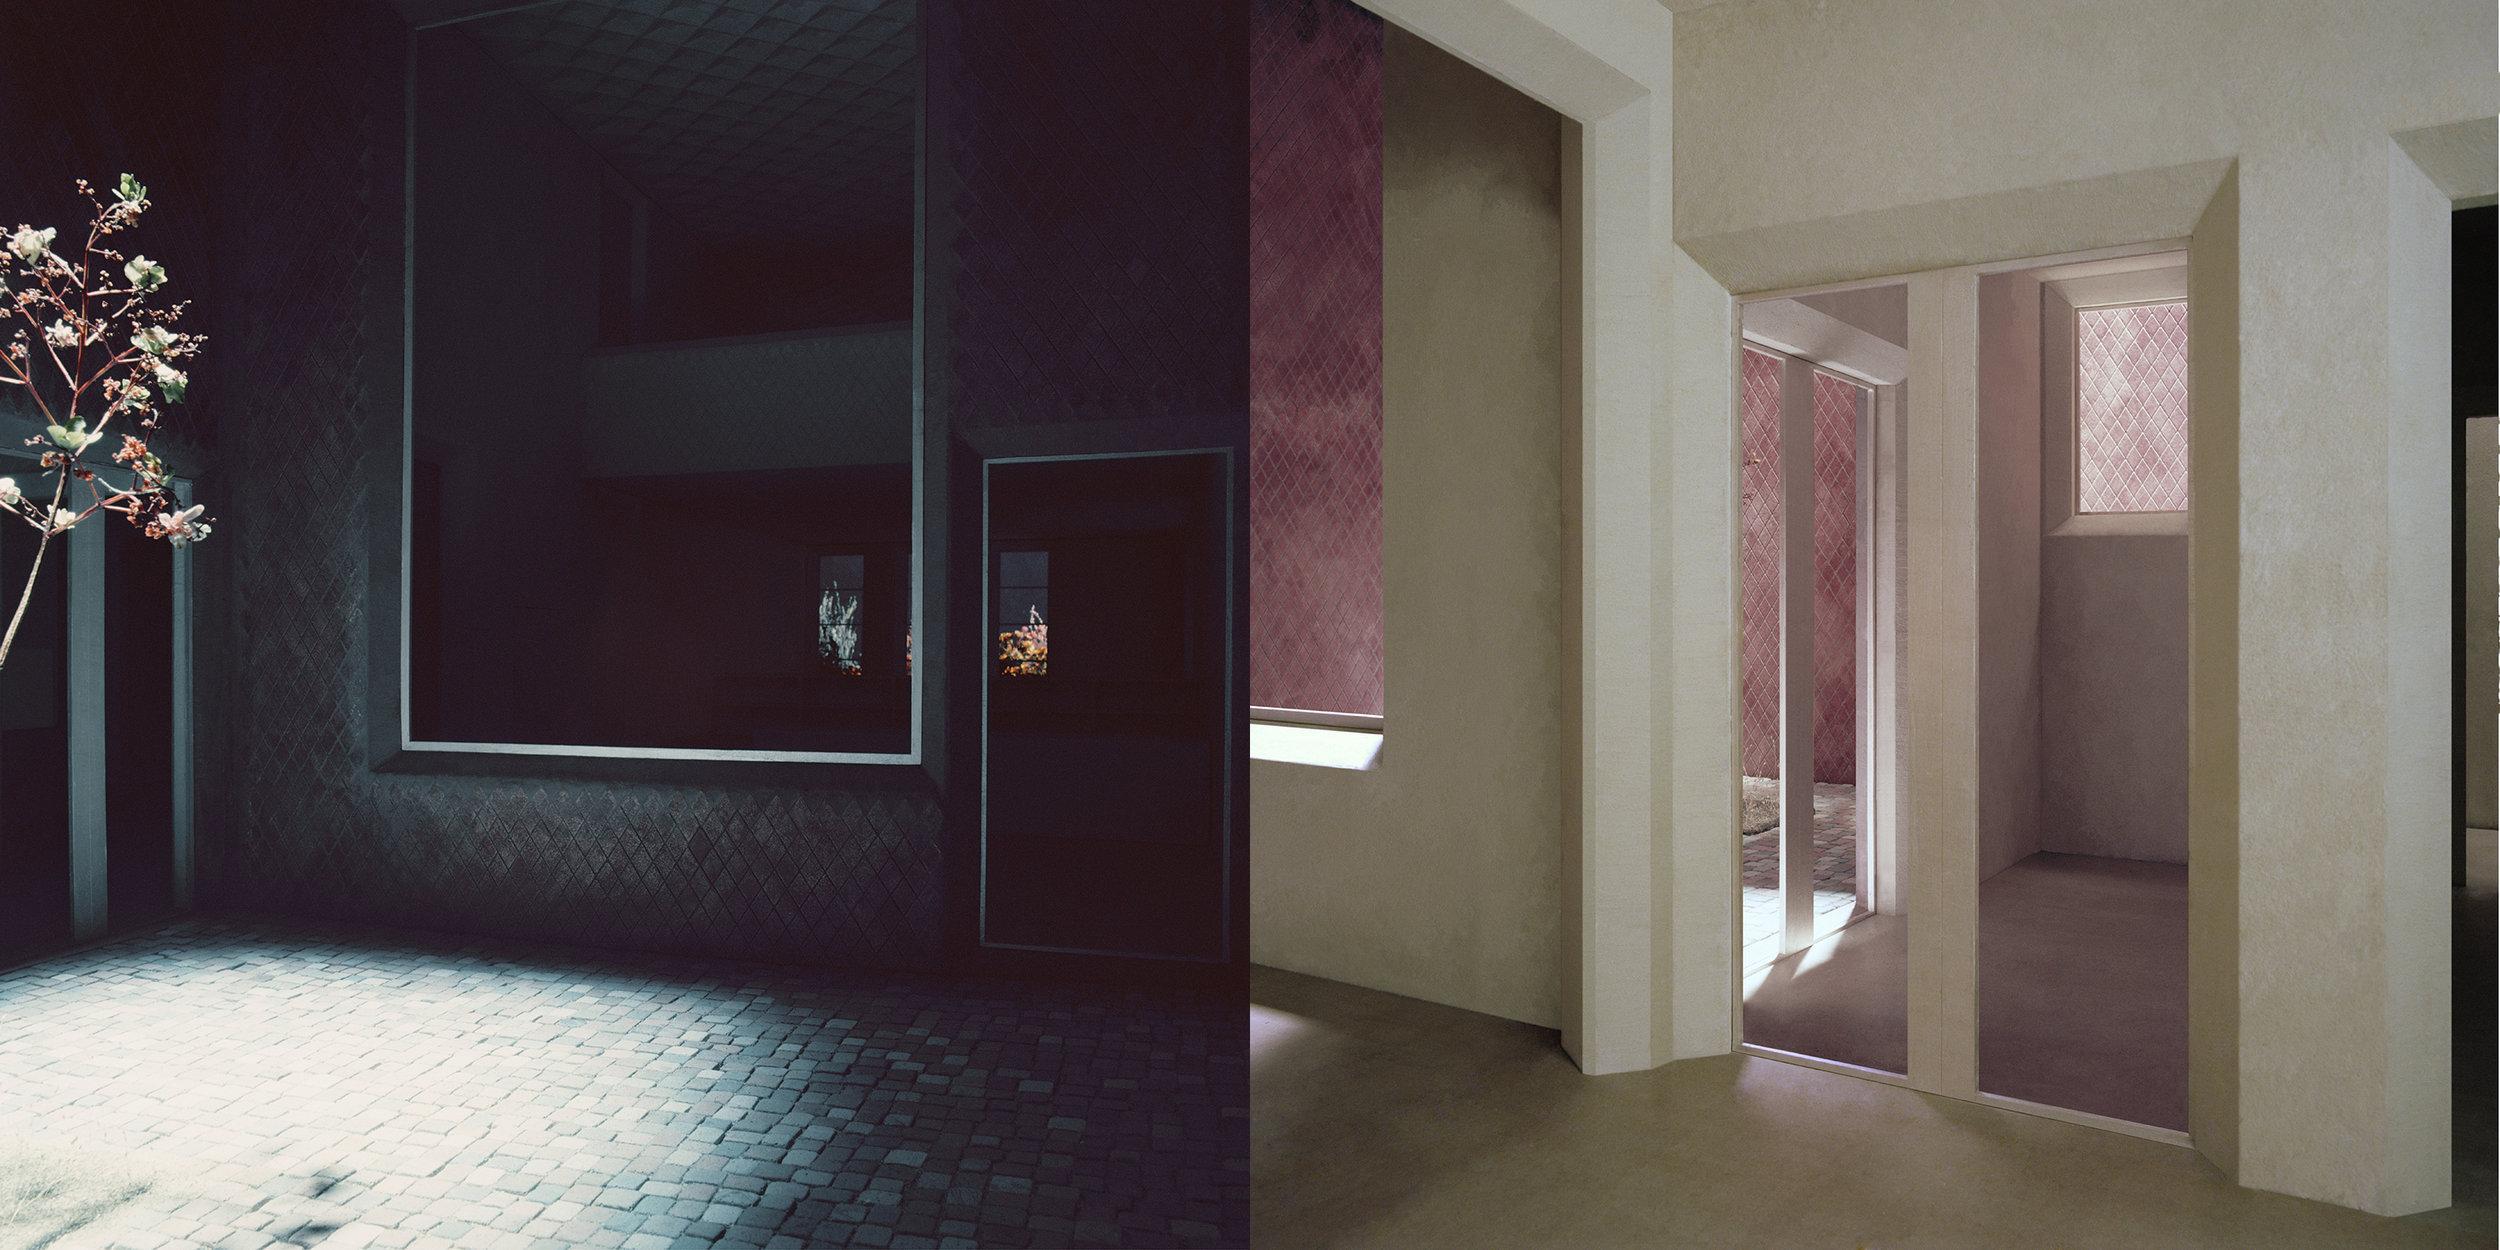 Vestibule, Francesca Torzo, copyright Z33, photo: Gion Balthasar von Albertini